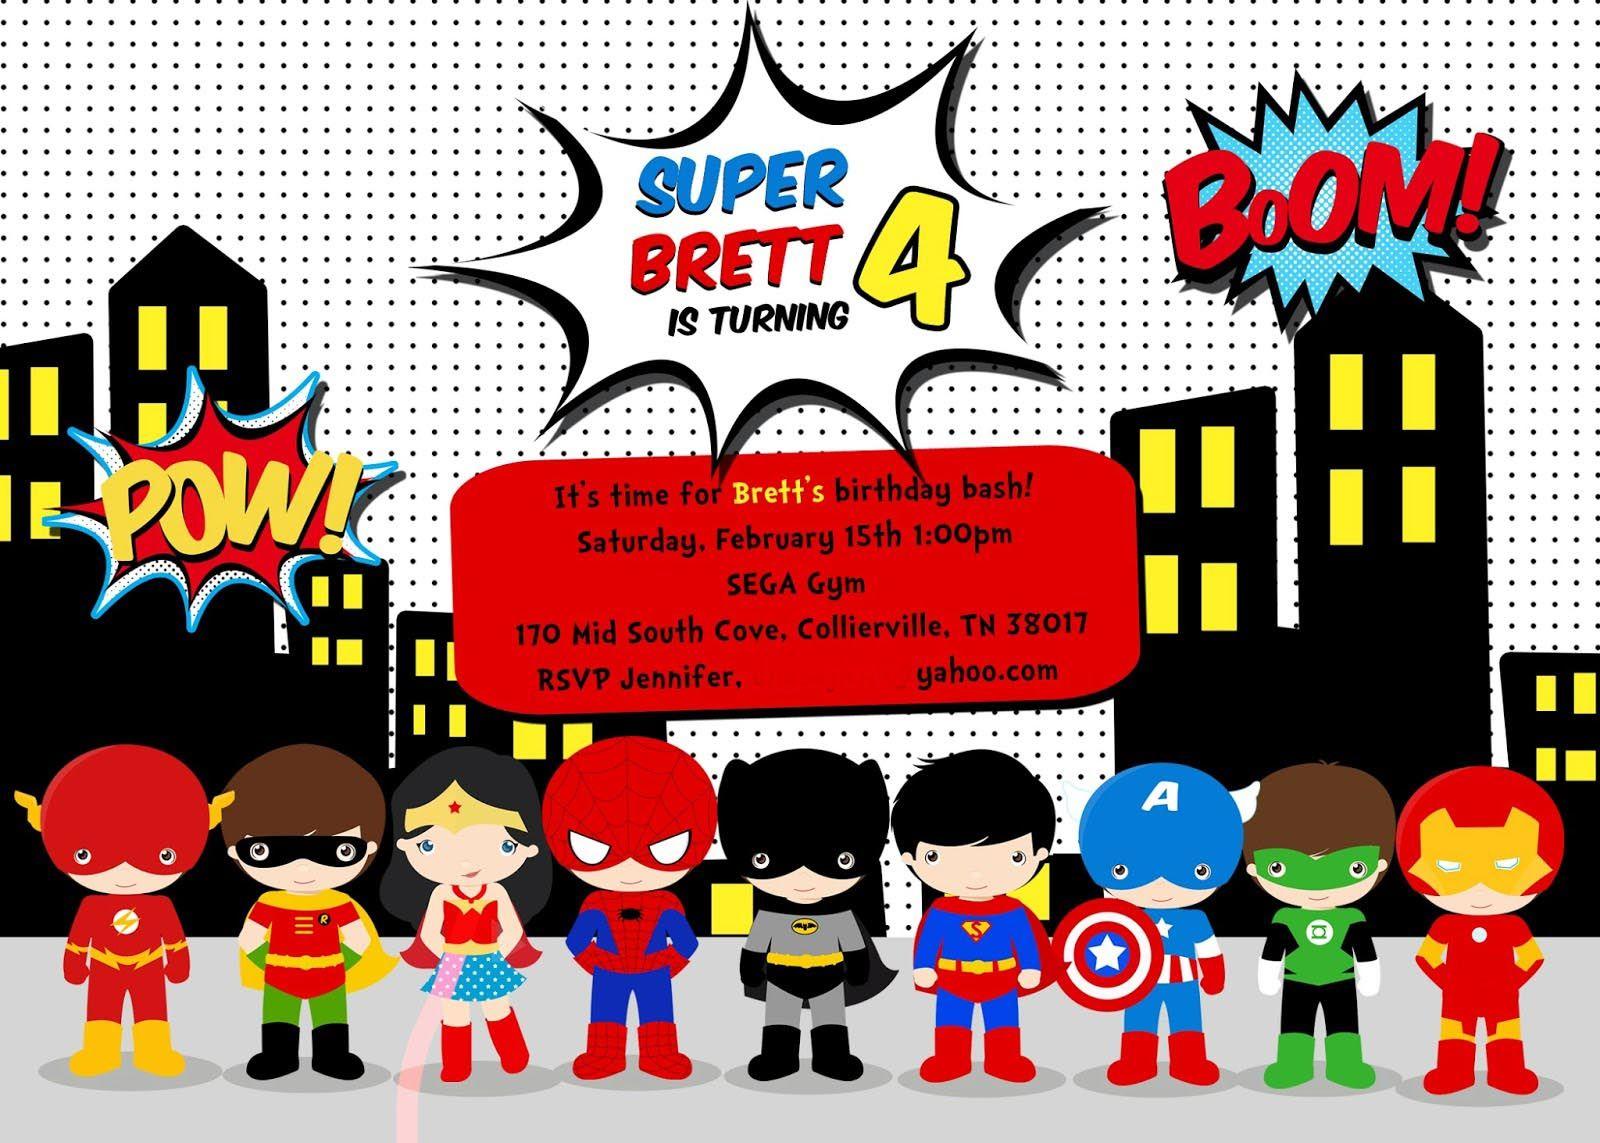 004 Fascinating Editable Superhero Invitation Template Free Inspiration Full